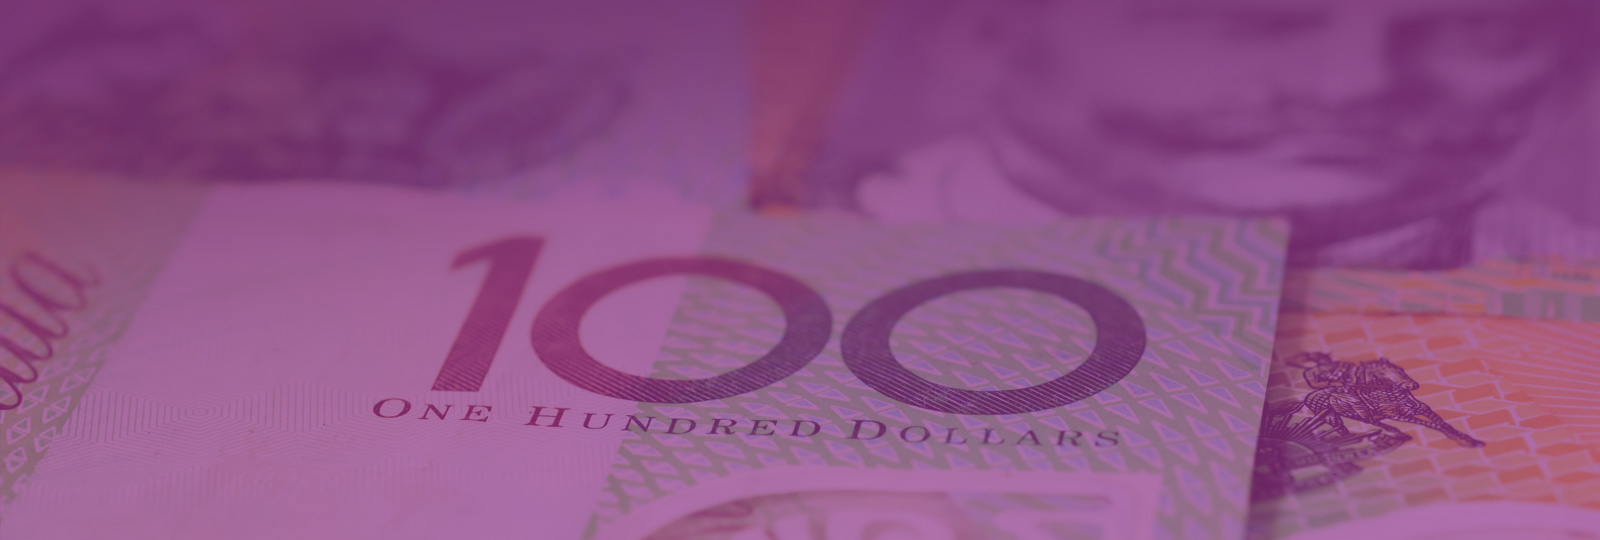 Convert Australian Dollars to Pounds